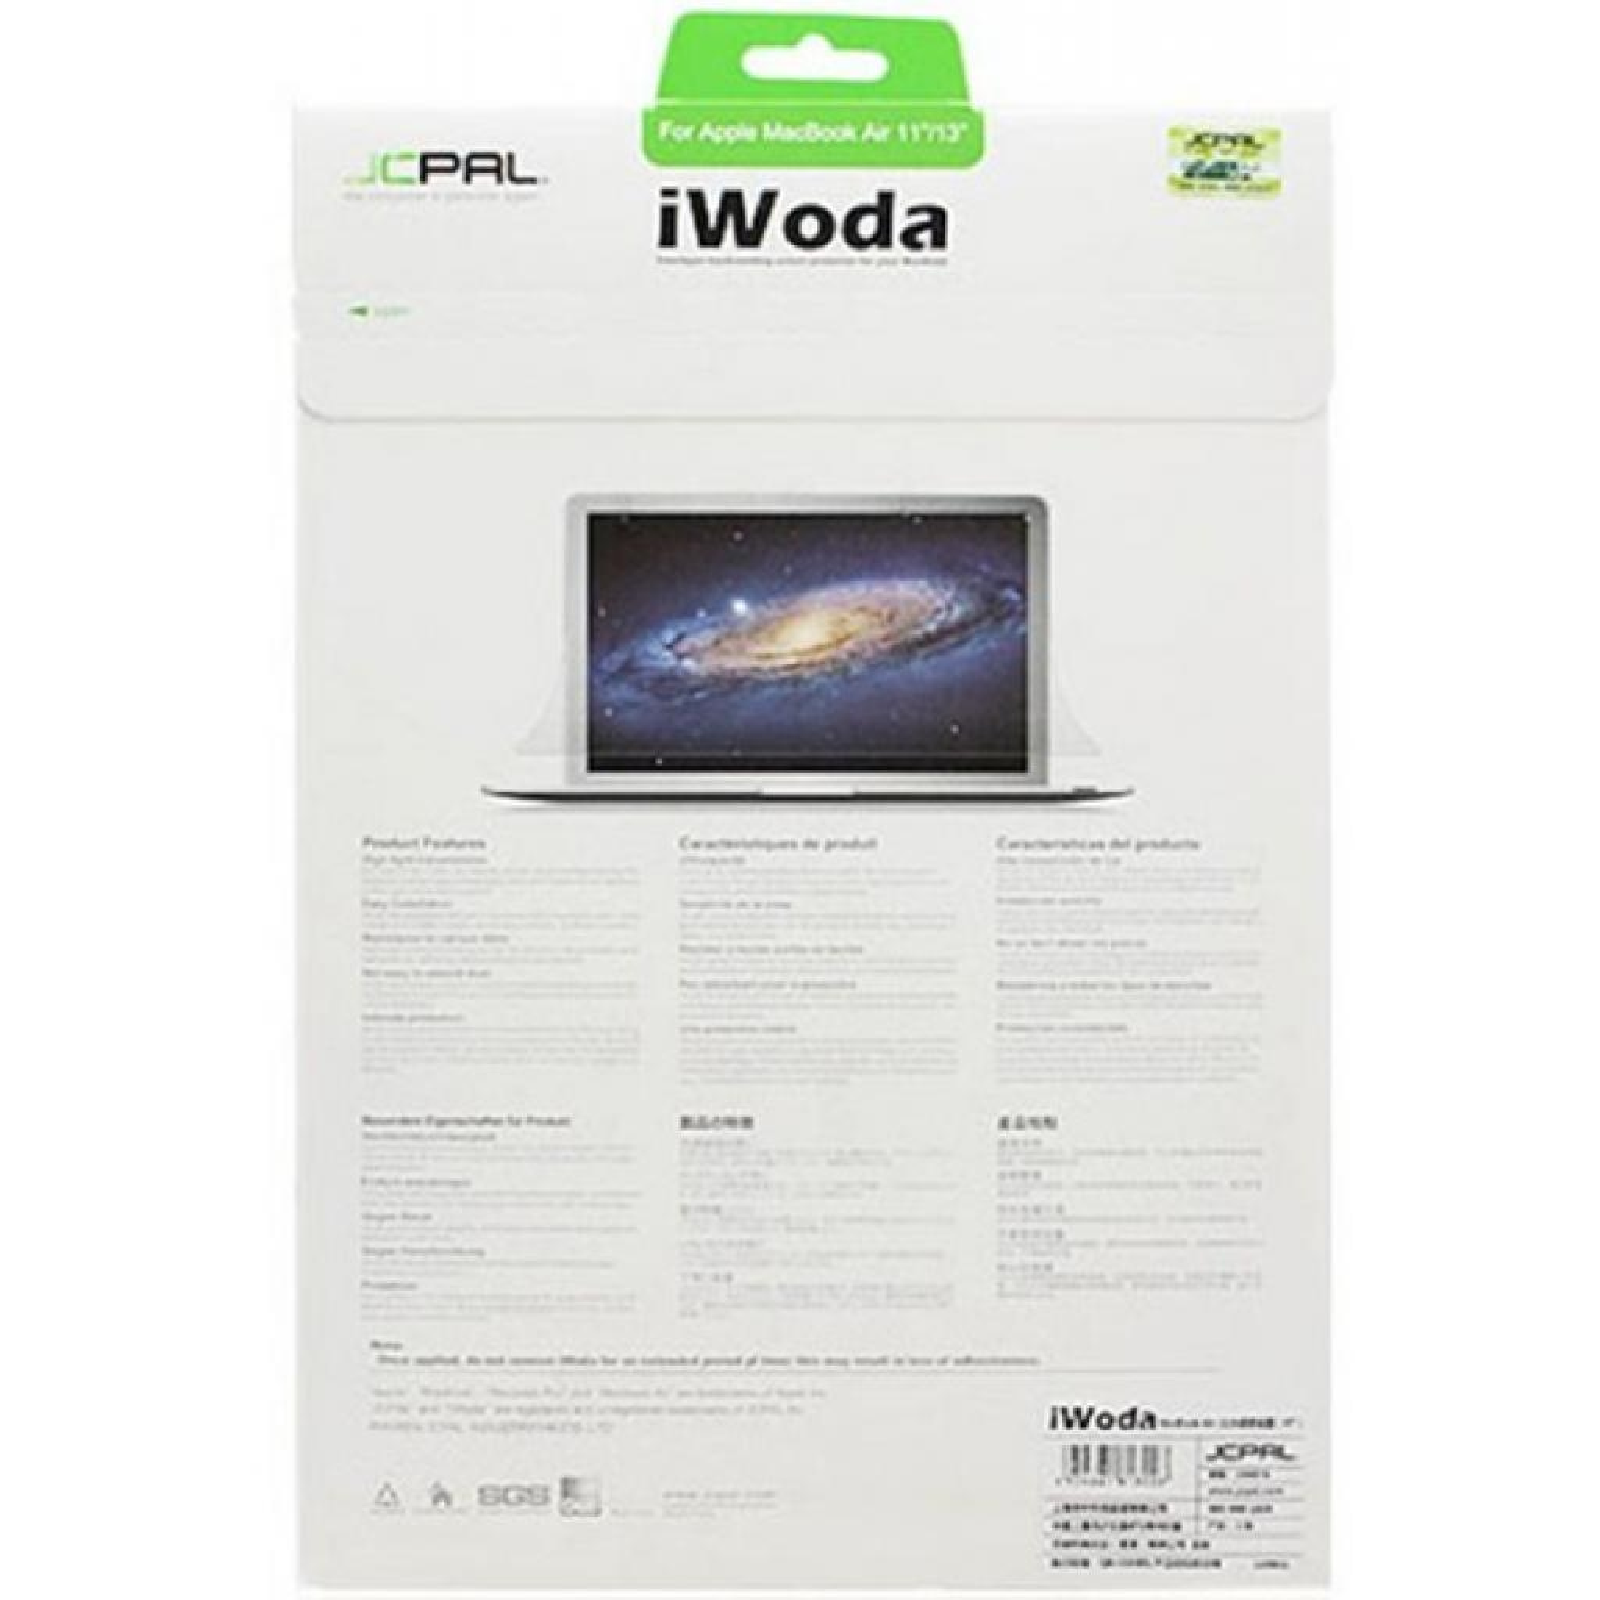 Пленка защитная JCPAL iWoda для MacBook Air 13 (High Transparency) (JCP2010) изображение 2